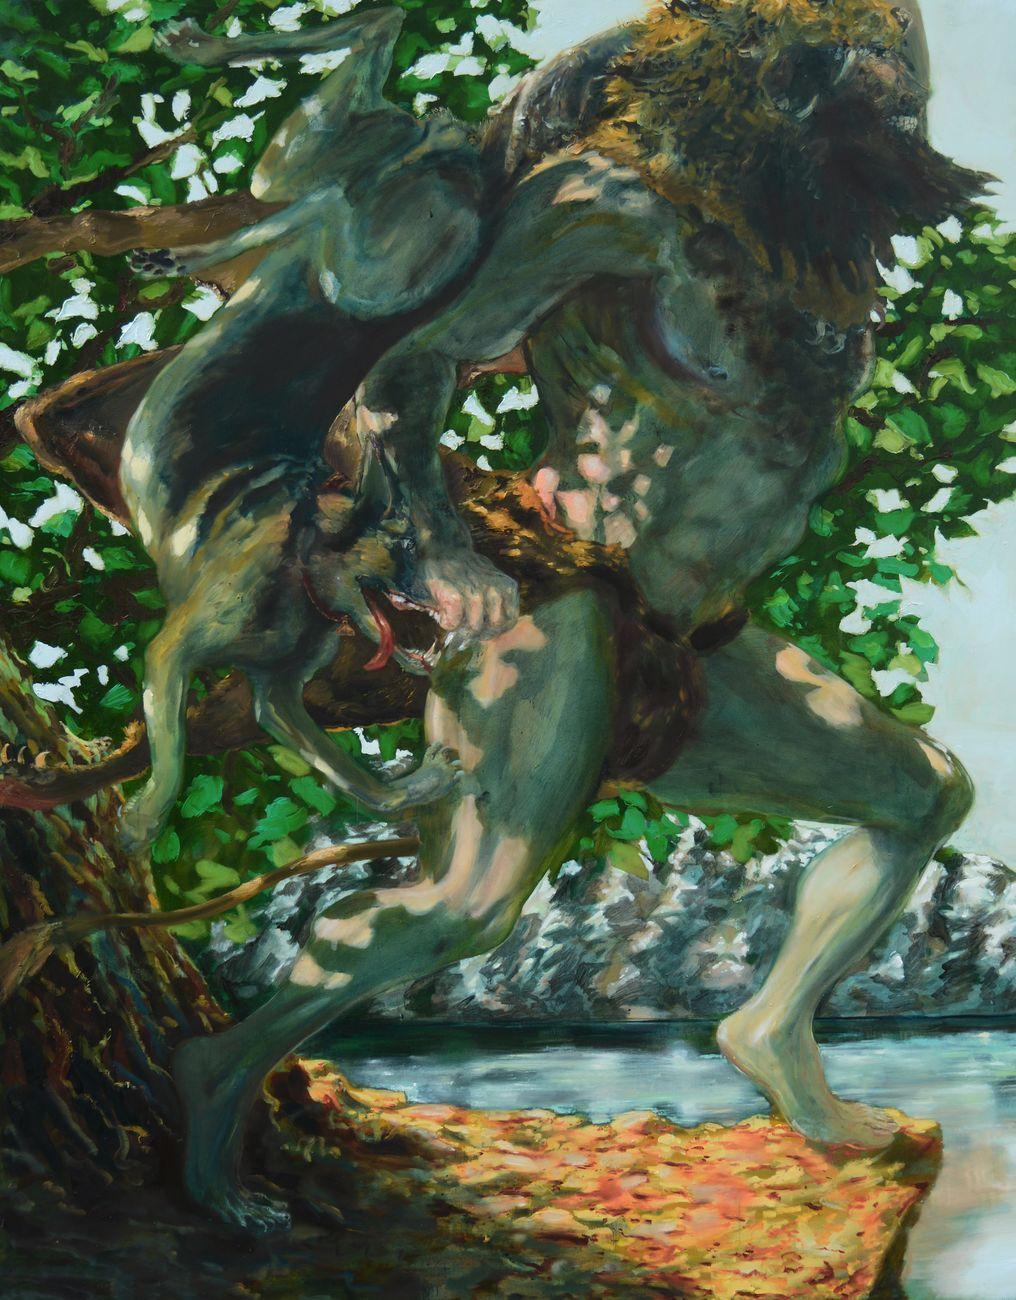 Thomas Braida, Hercules e il pastore tedesco, 2015, cm 251x201, olio su tela